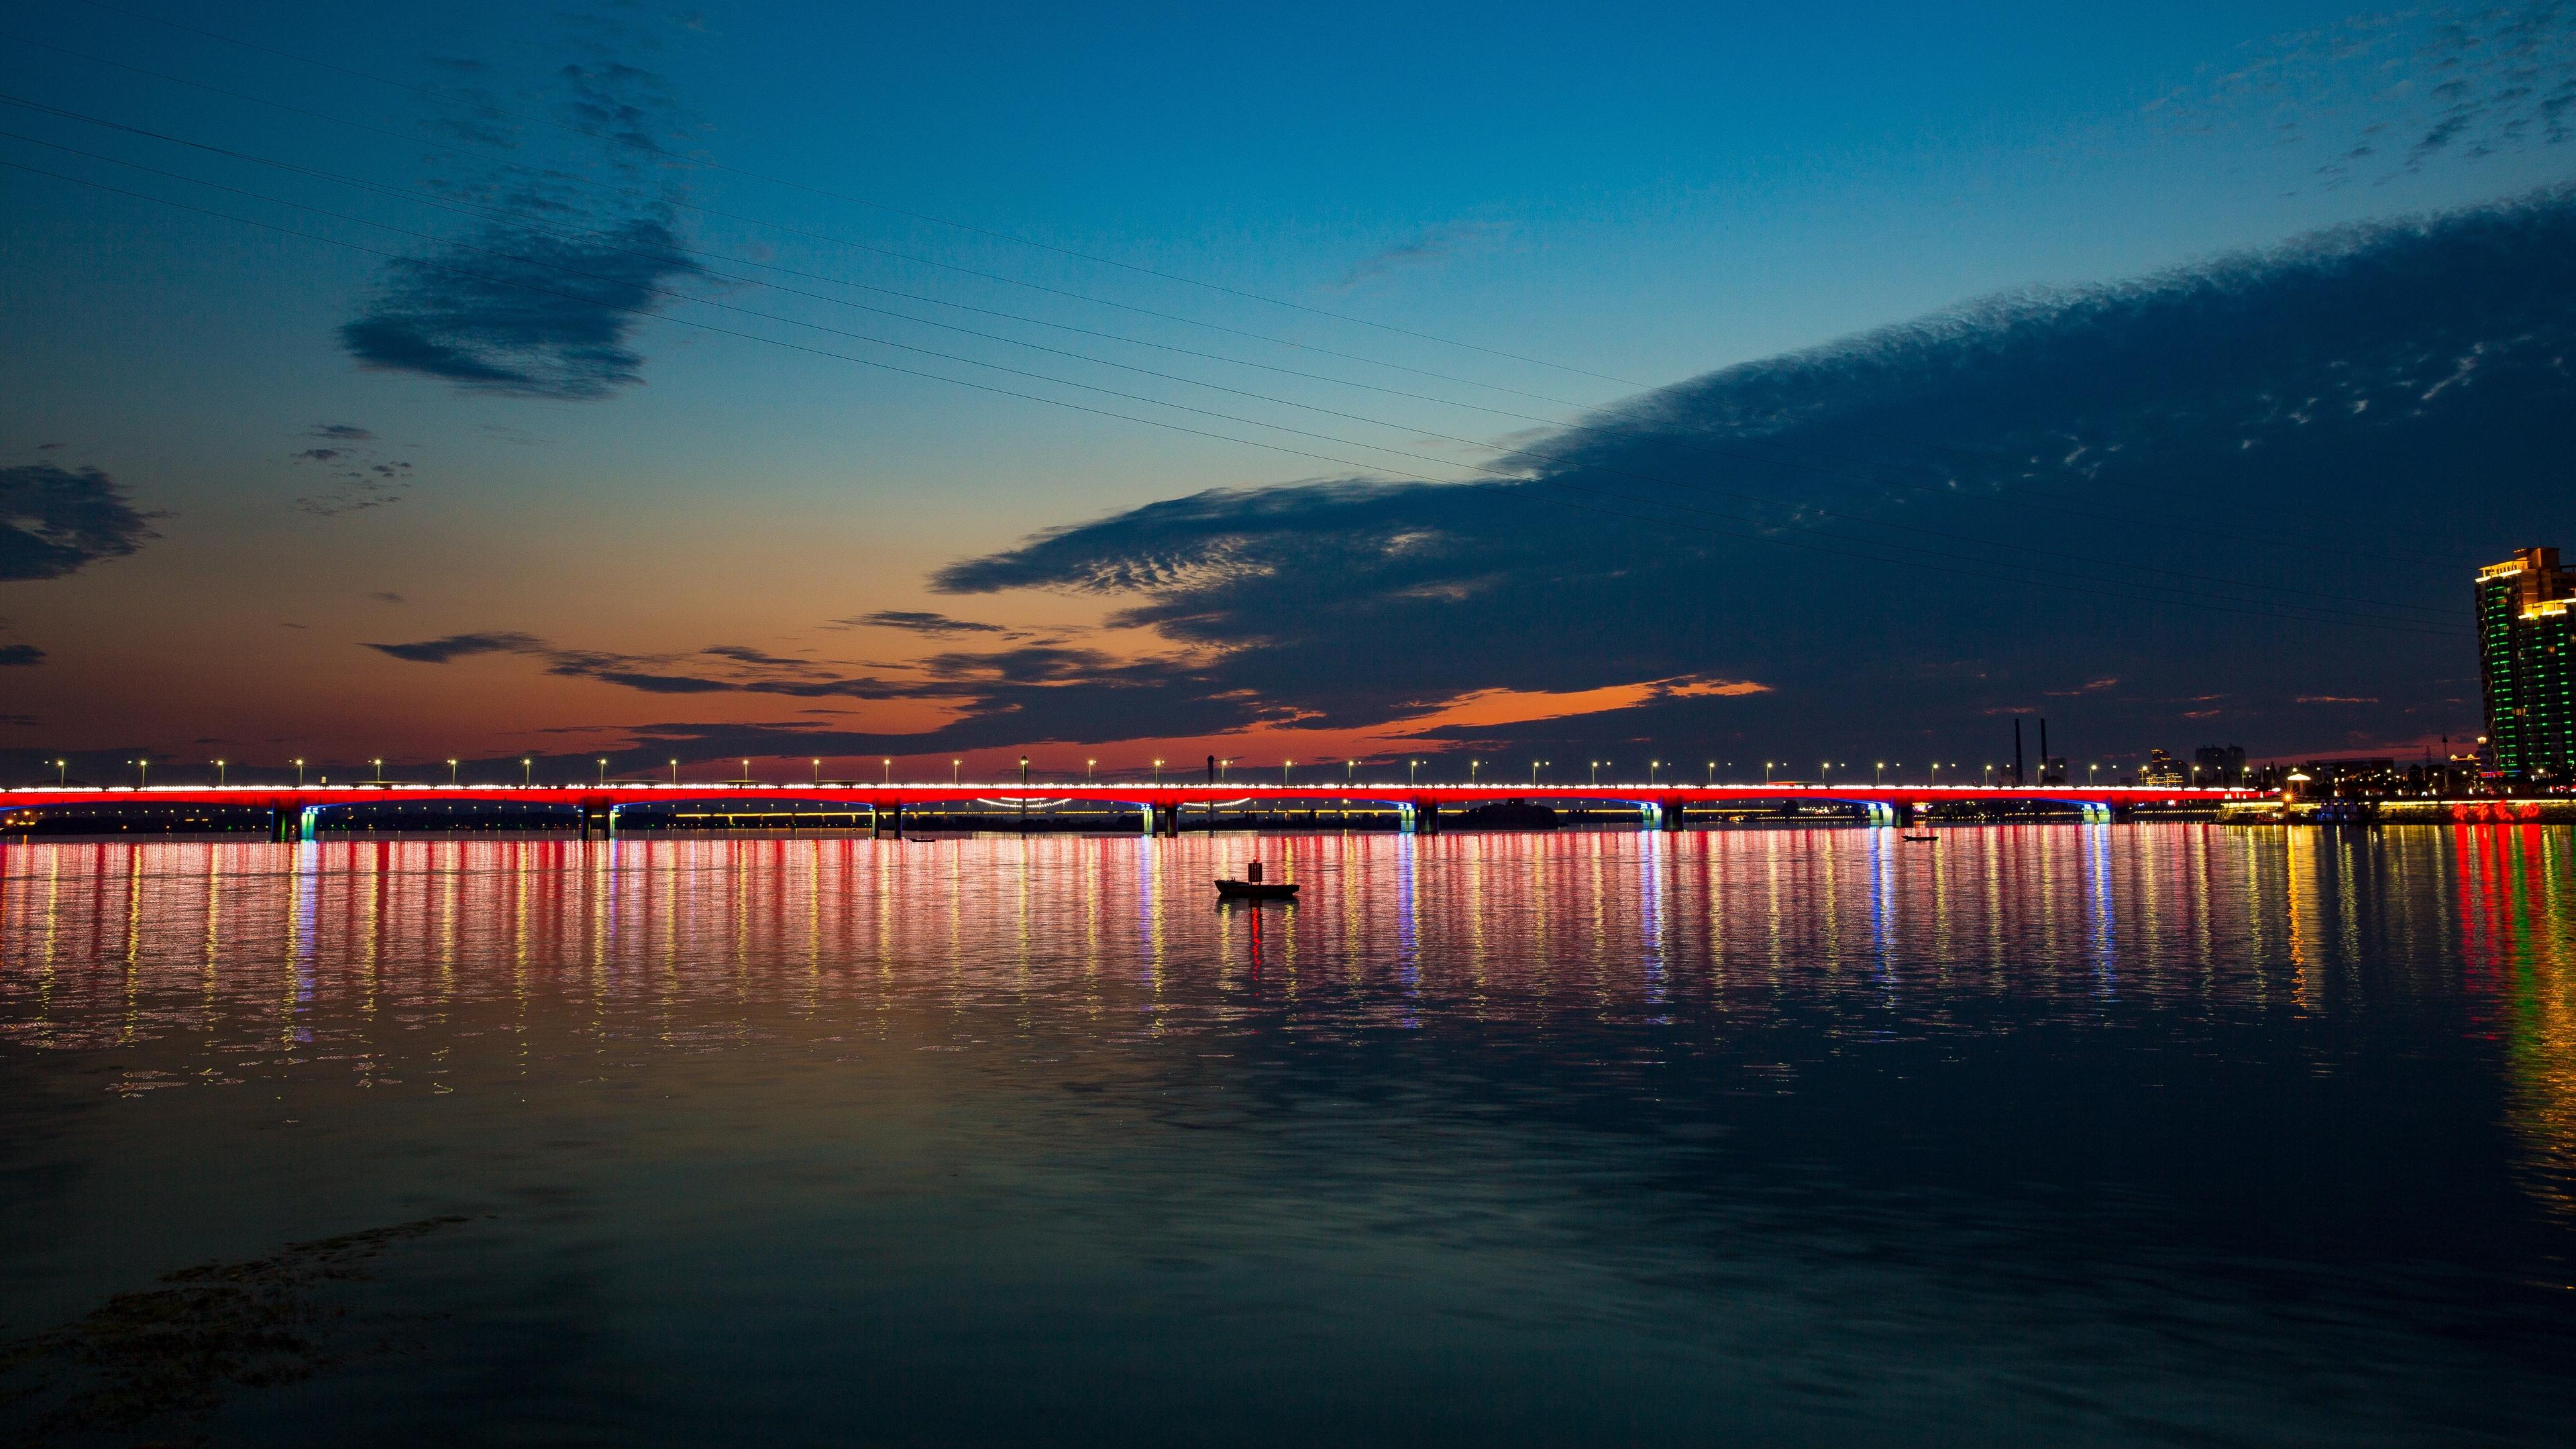 night city bridge boat sea 4k 1538066409 - night city, bridge, boat, sea 4k - night city, bridge, Boat